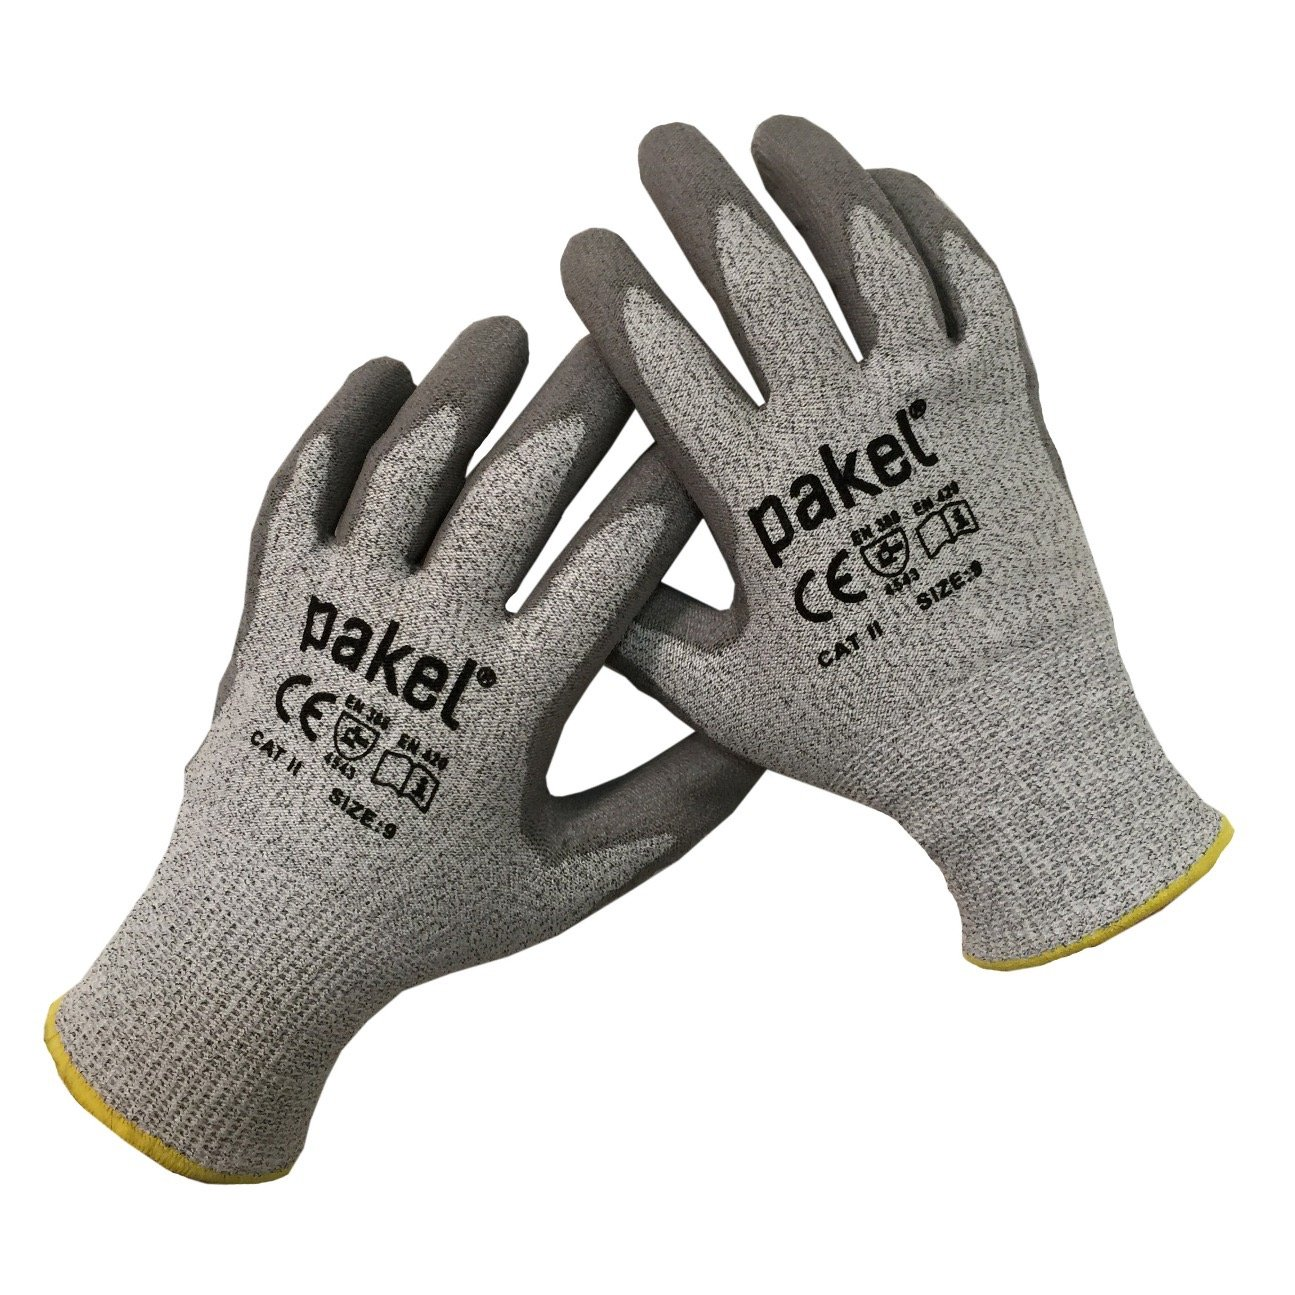 Pakel Y-01-08 High Performance En388 CE Level 5 Cut Resistant Knit Wrist Gloves (Size 8/Medium)